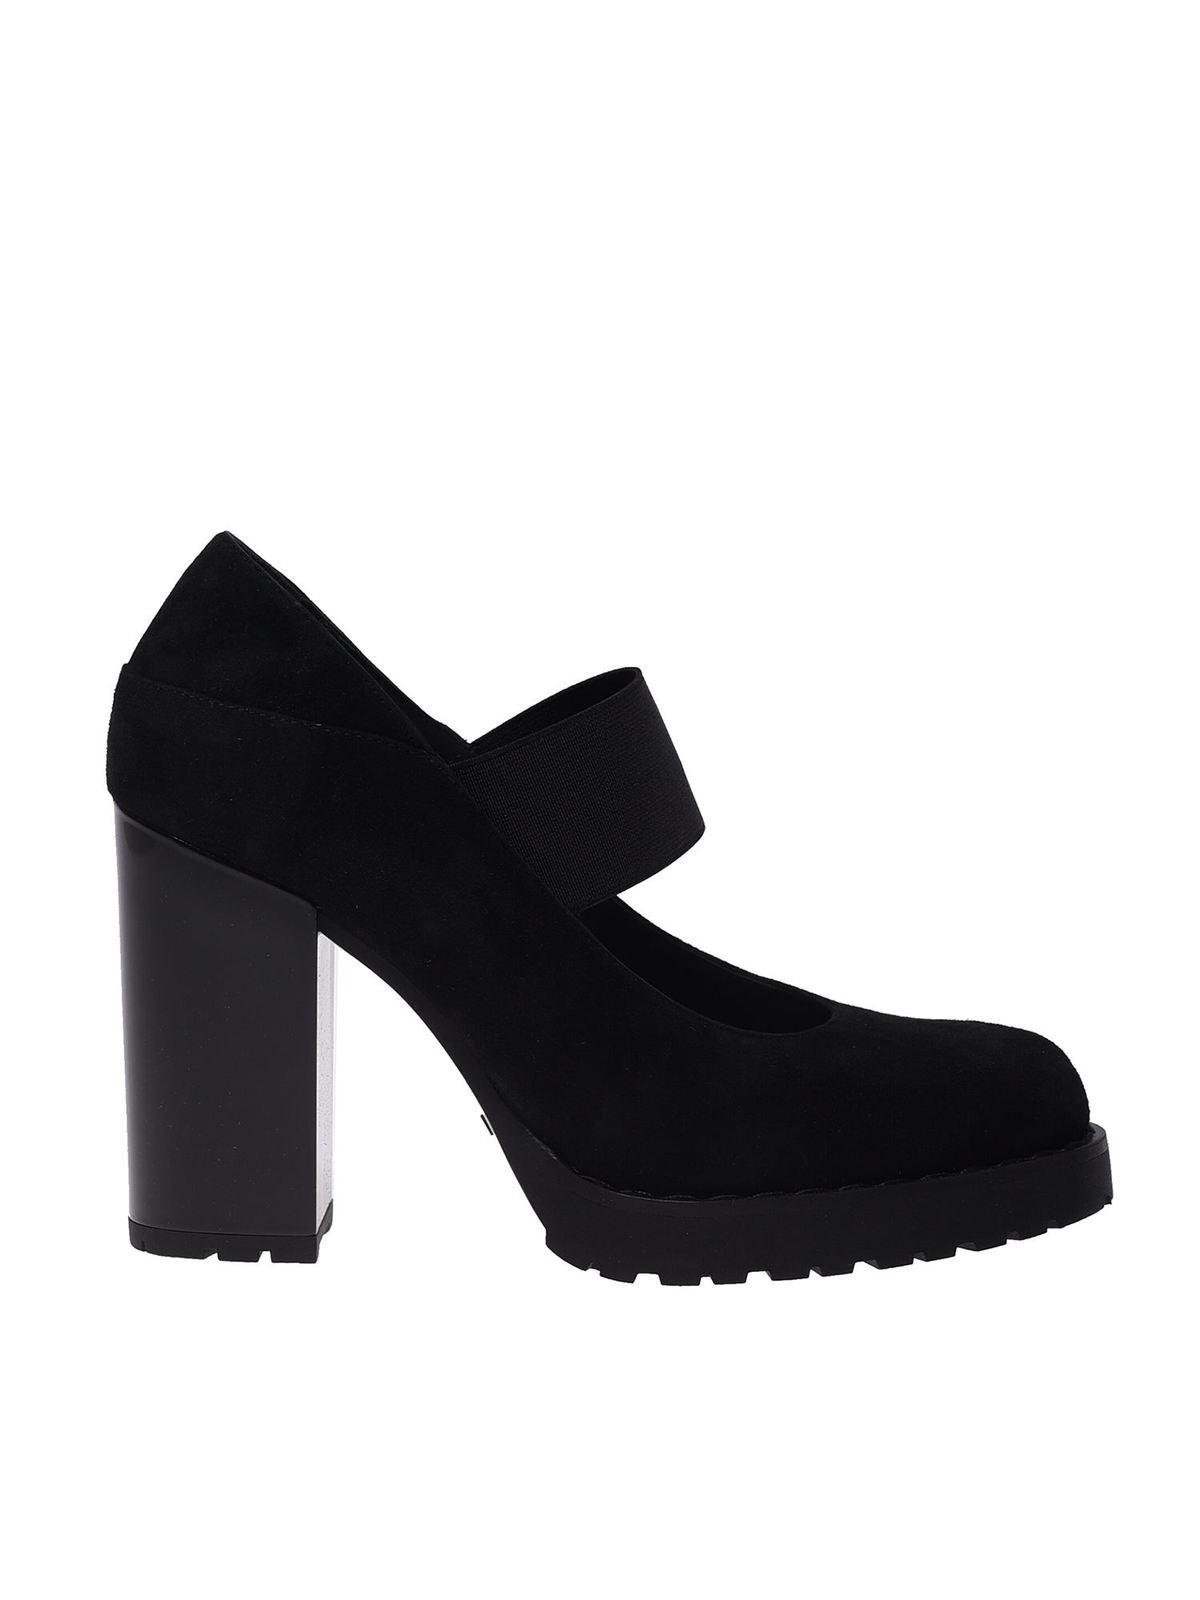 Court shoes Hogan - Elastic band pumps in black - HXW5420DG50CR0B999